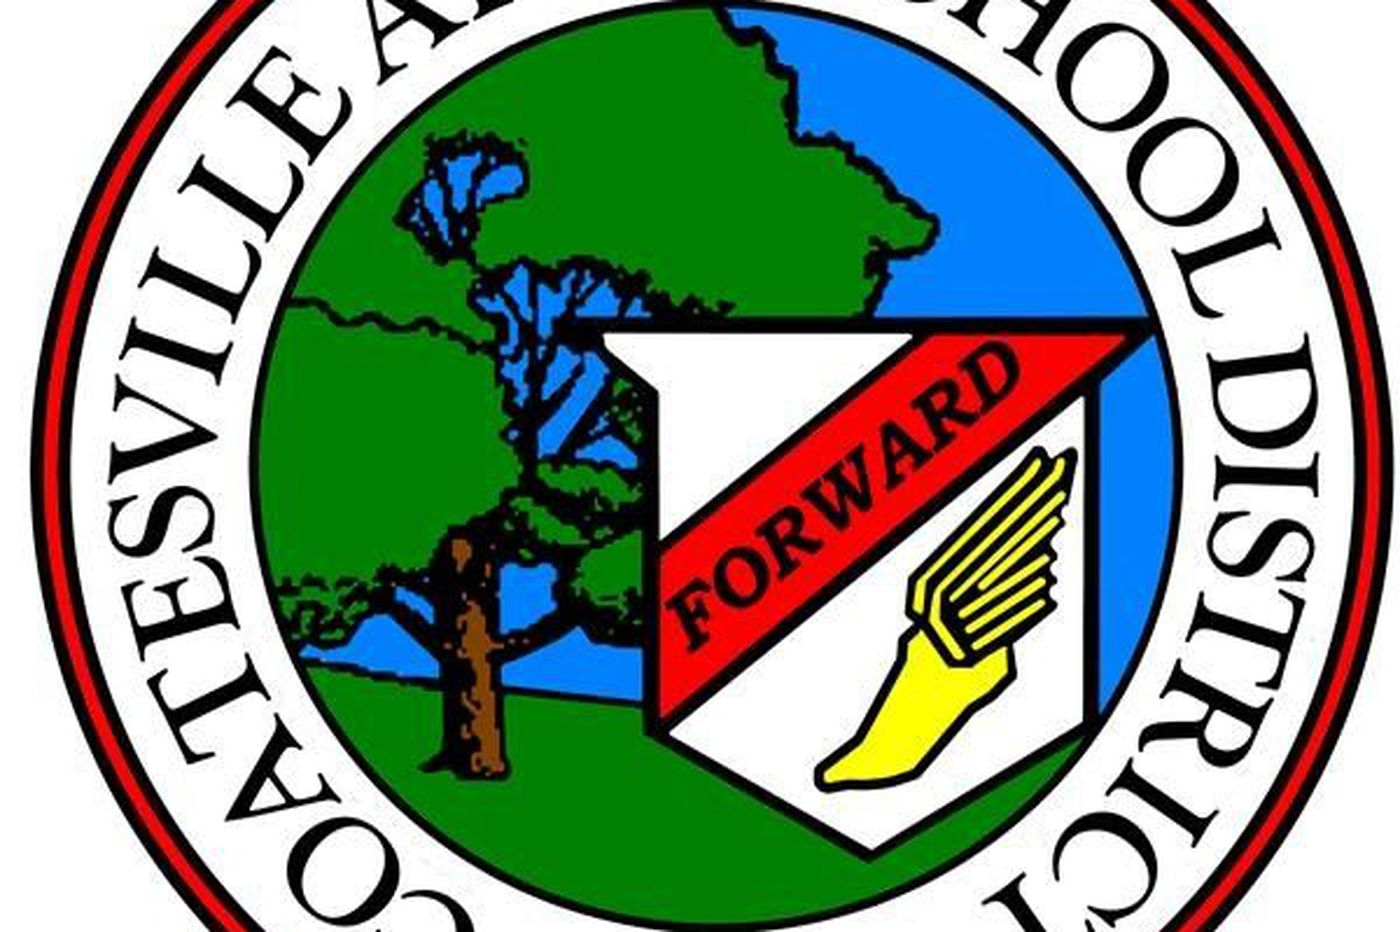 Coatesville schools try 'rebranding' to win back students